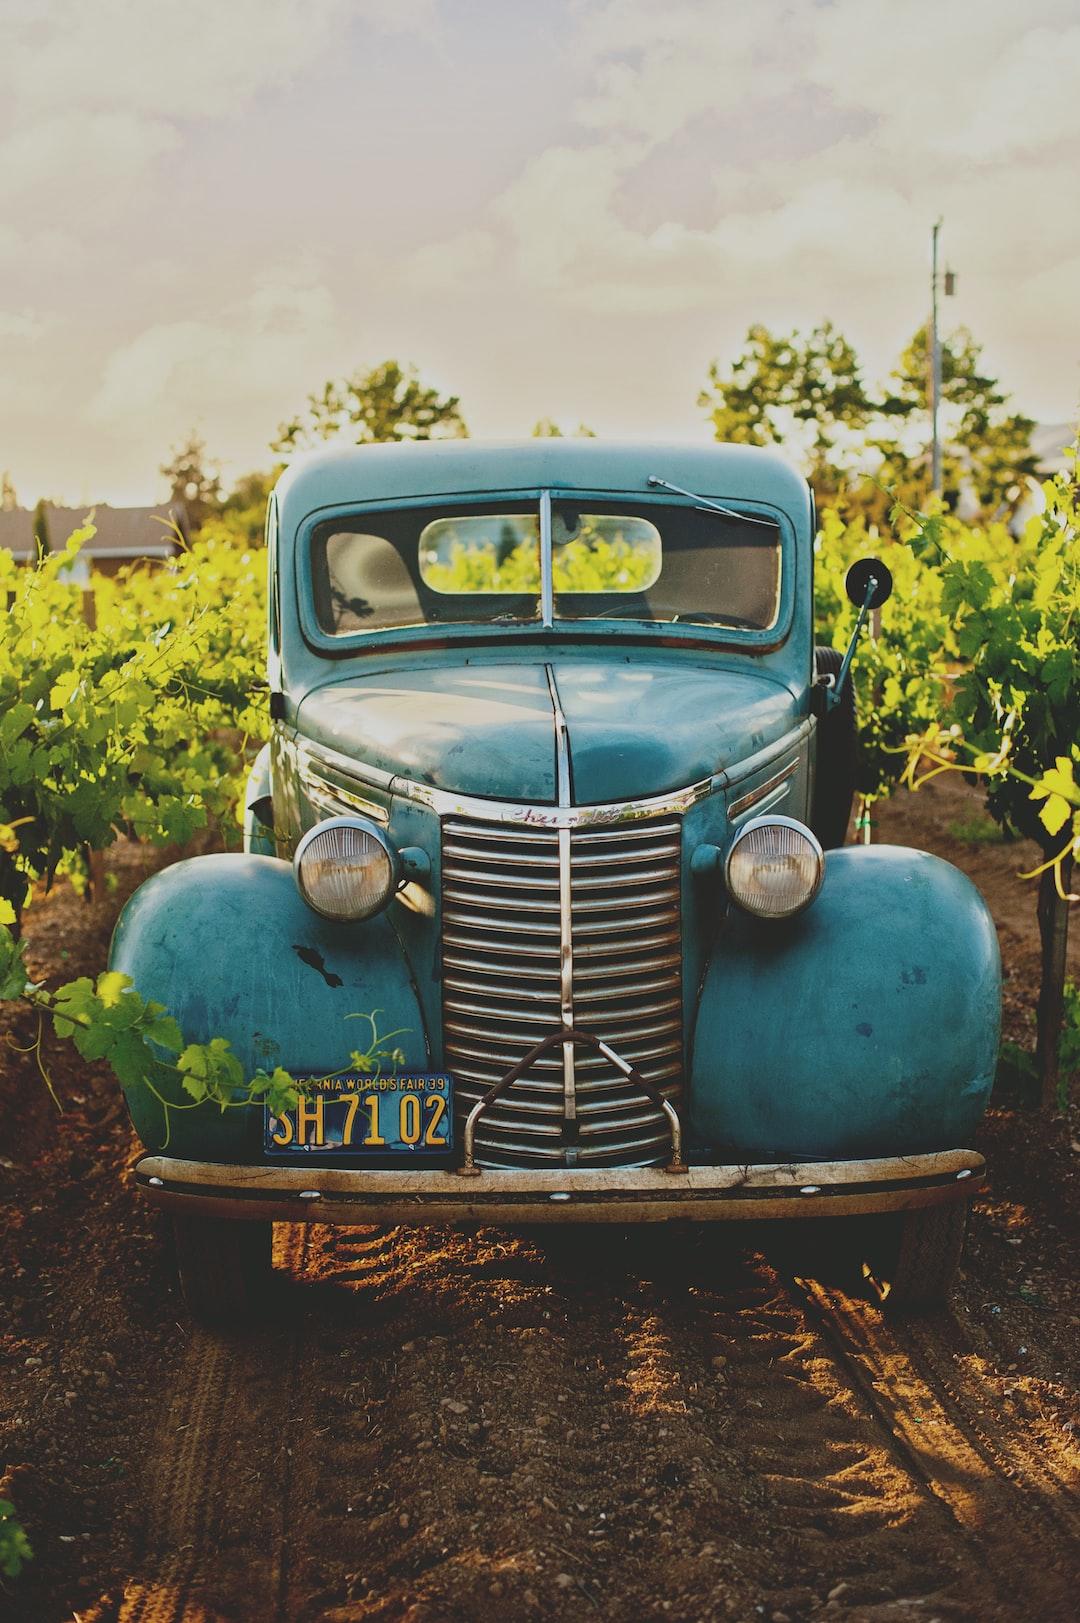 blue vintage car on a dirt road photo by cayton heath cayton on unsplash. Black Bedroom Furniture Sets. Home Design Ideas